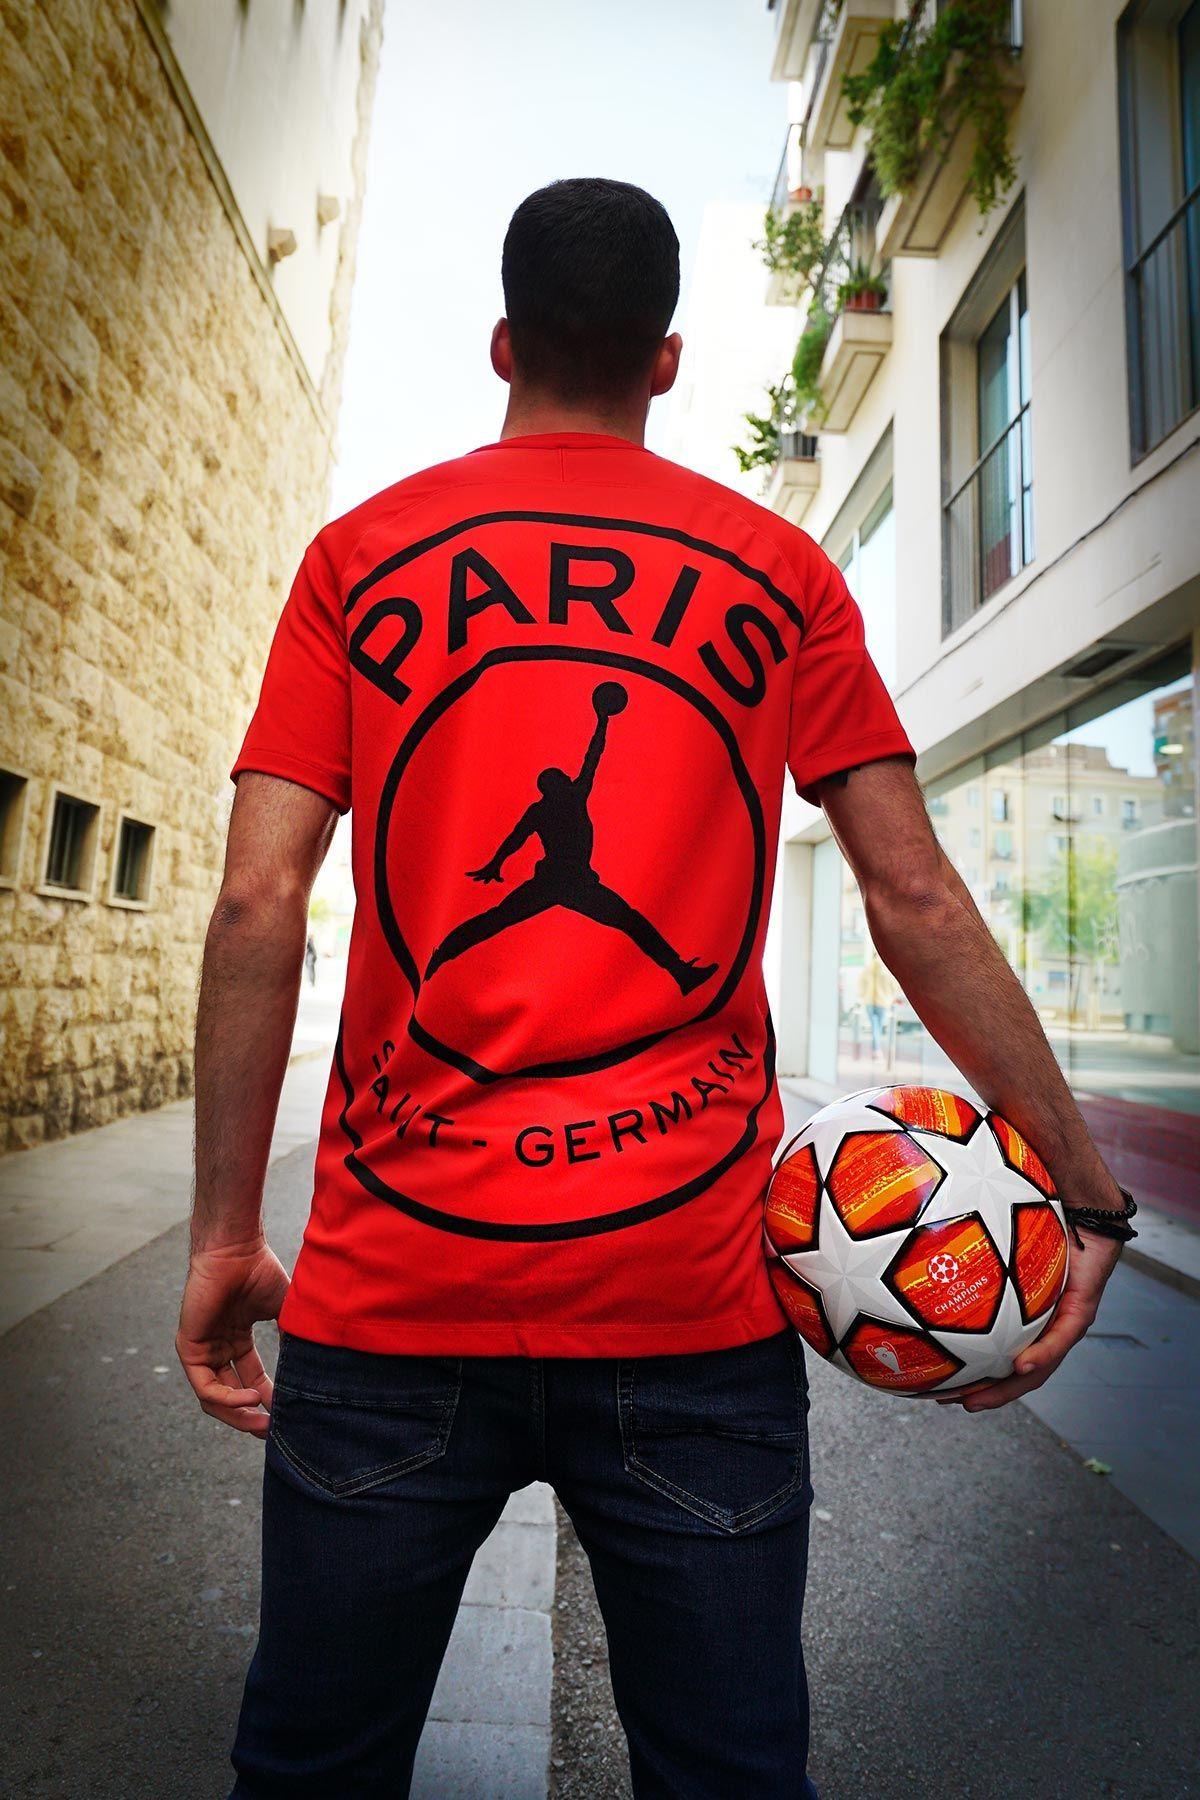 picar Stevenson Profesor de escuela  Camiseta PSG Jordan entreno Squad #nike #psg #championsleague #soccer Foto:  @donforofo (instagram) para #futbolm… | Camisetas de equipo, Equipo de  fútbol, Fútbol